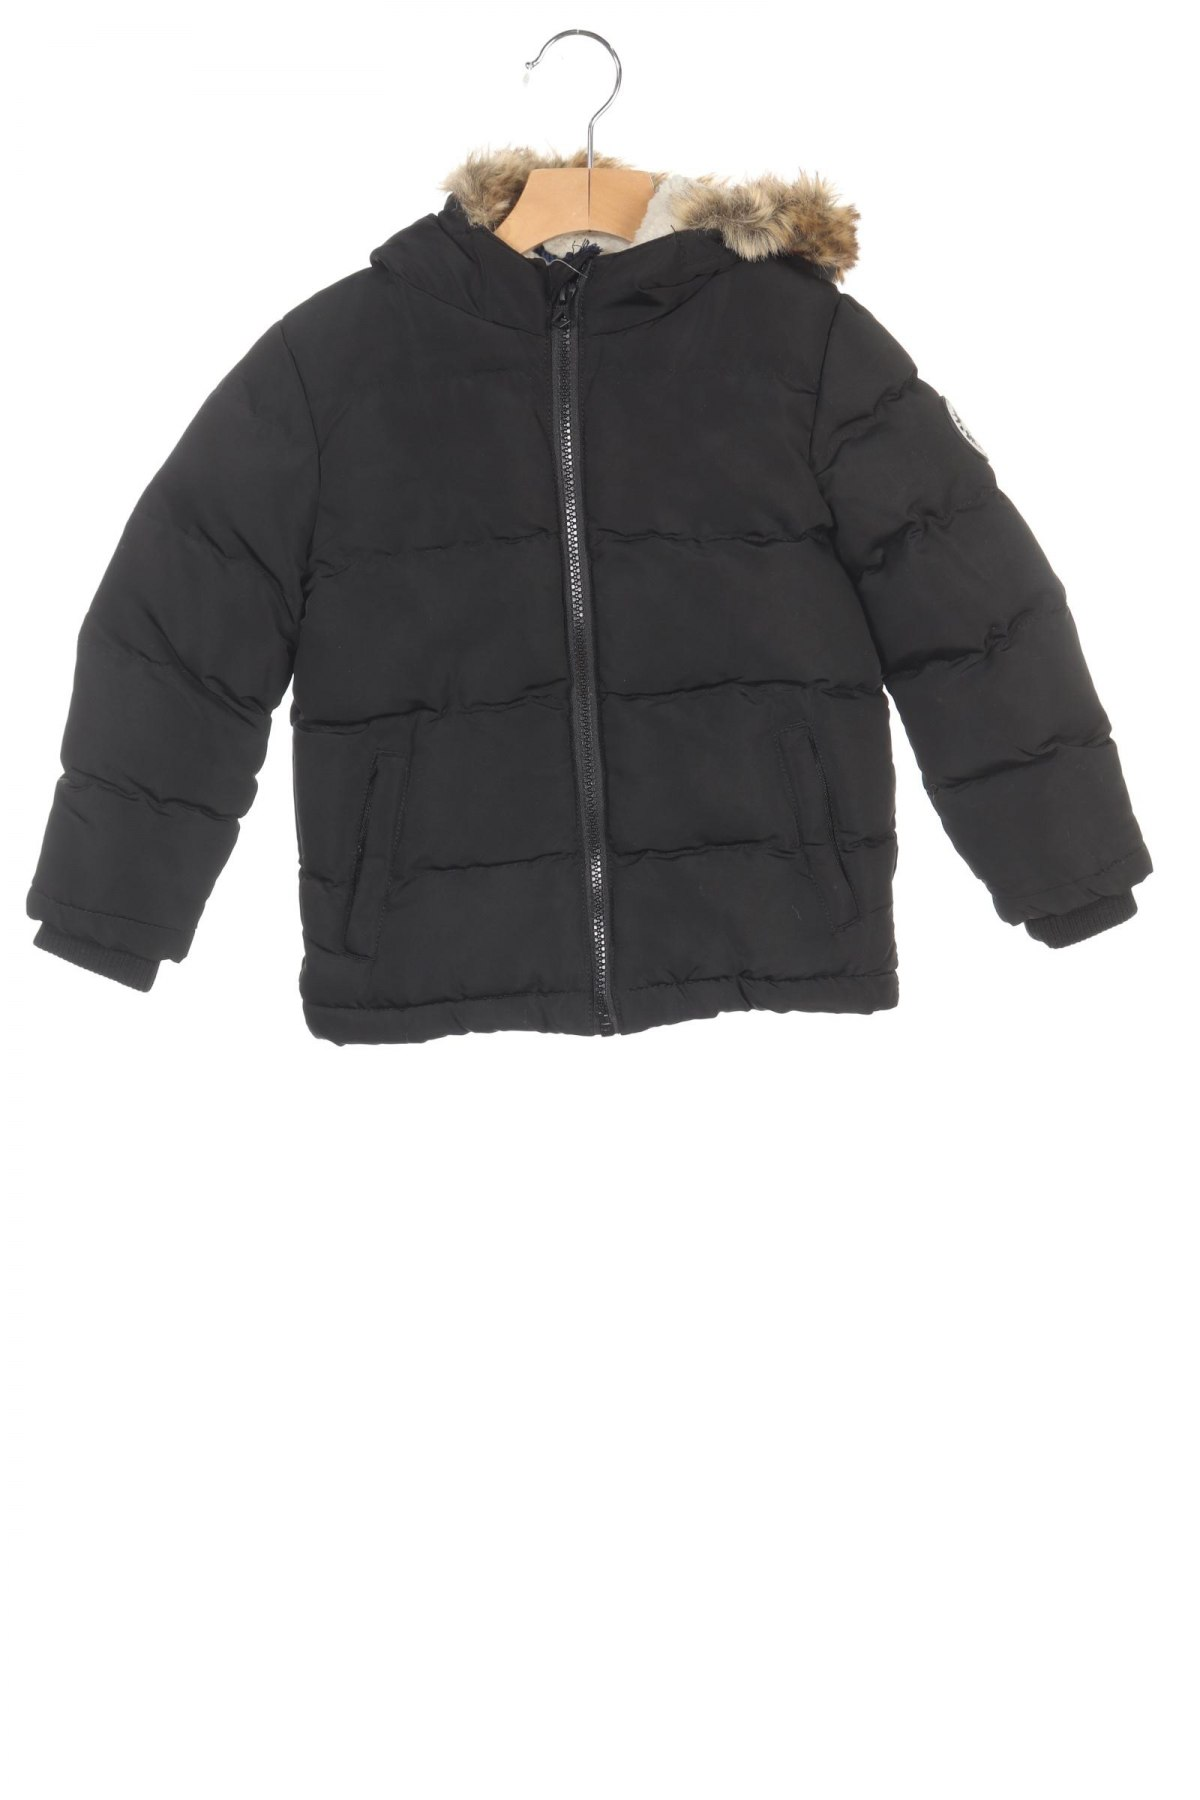 Детско яке Soulcal & Co, Размер 2-3y/ 98-104 см, Цвят Черен, Полиестер, Цена 54,60лв.